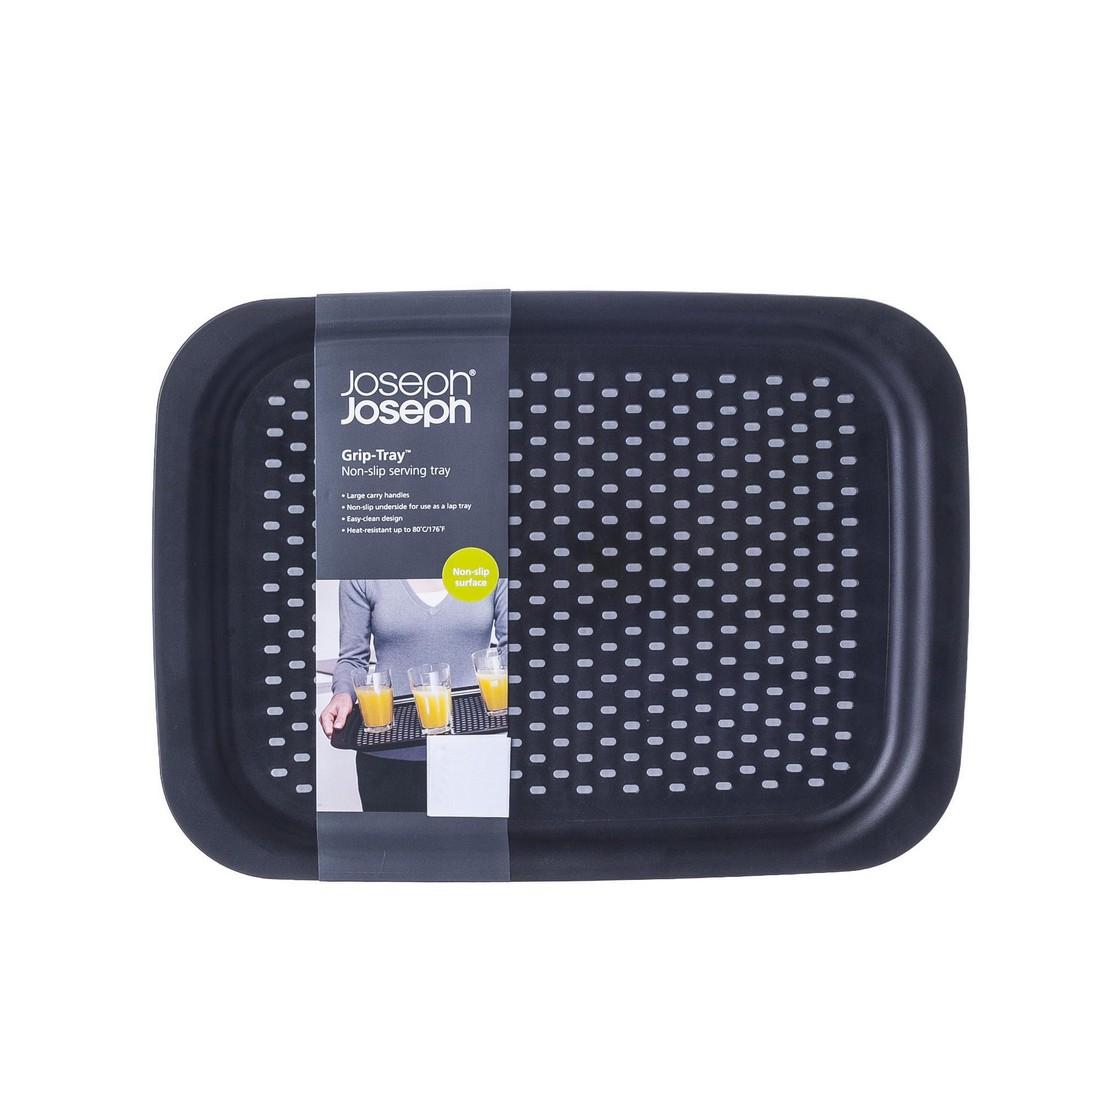 tablett grip tray antirutsch kunststoff schwarz joseph joseph online bestellen. Black Bedroom Furniture Sets. Home Design Ideas